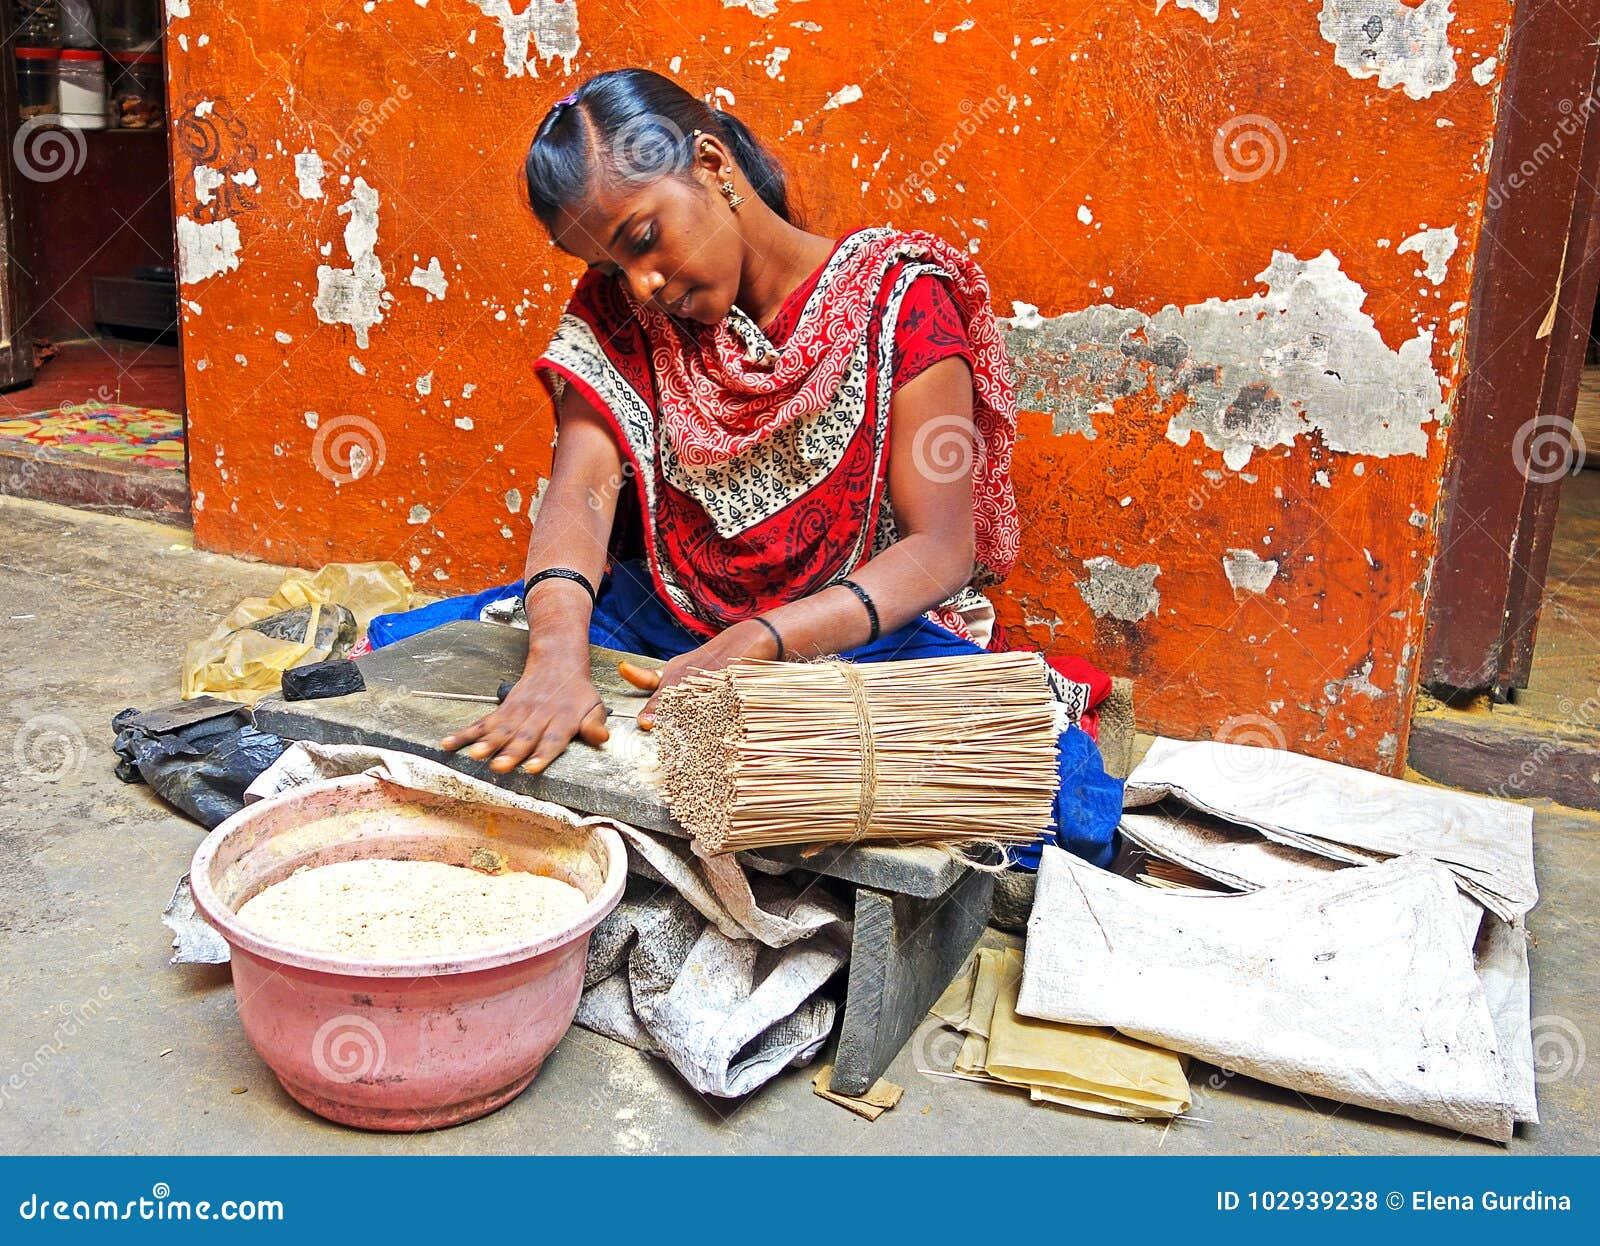 Indian Women Make Incense Sticks Editorial Stock Photo Image Of Relax Aromatherapy 102939238